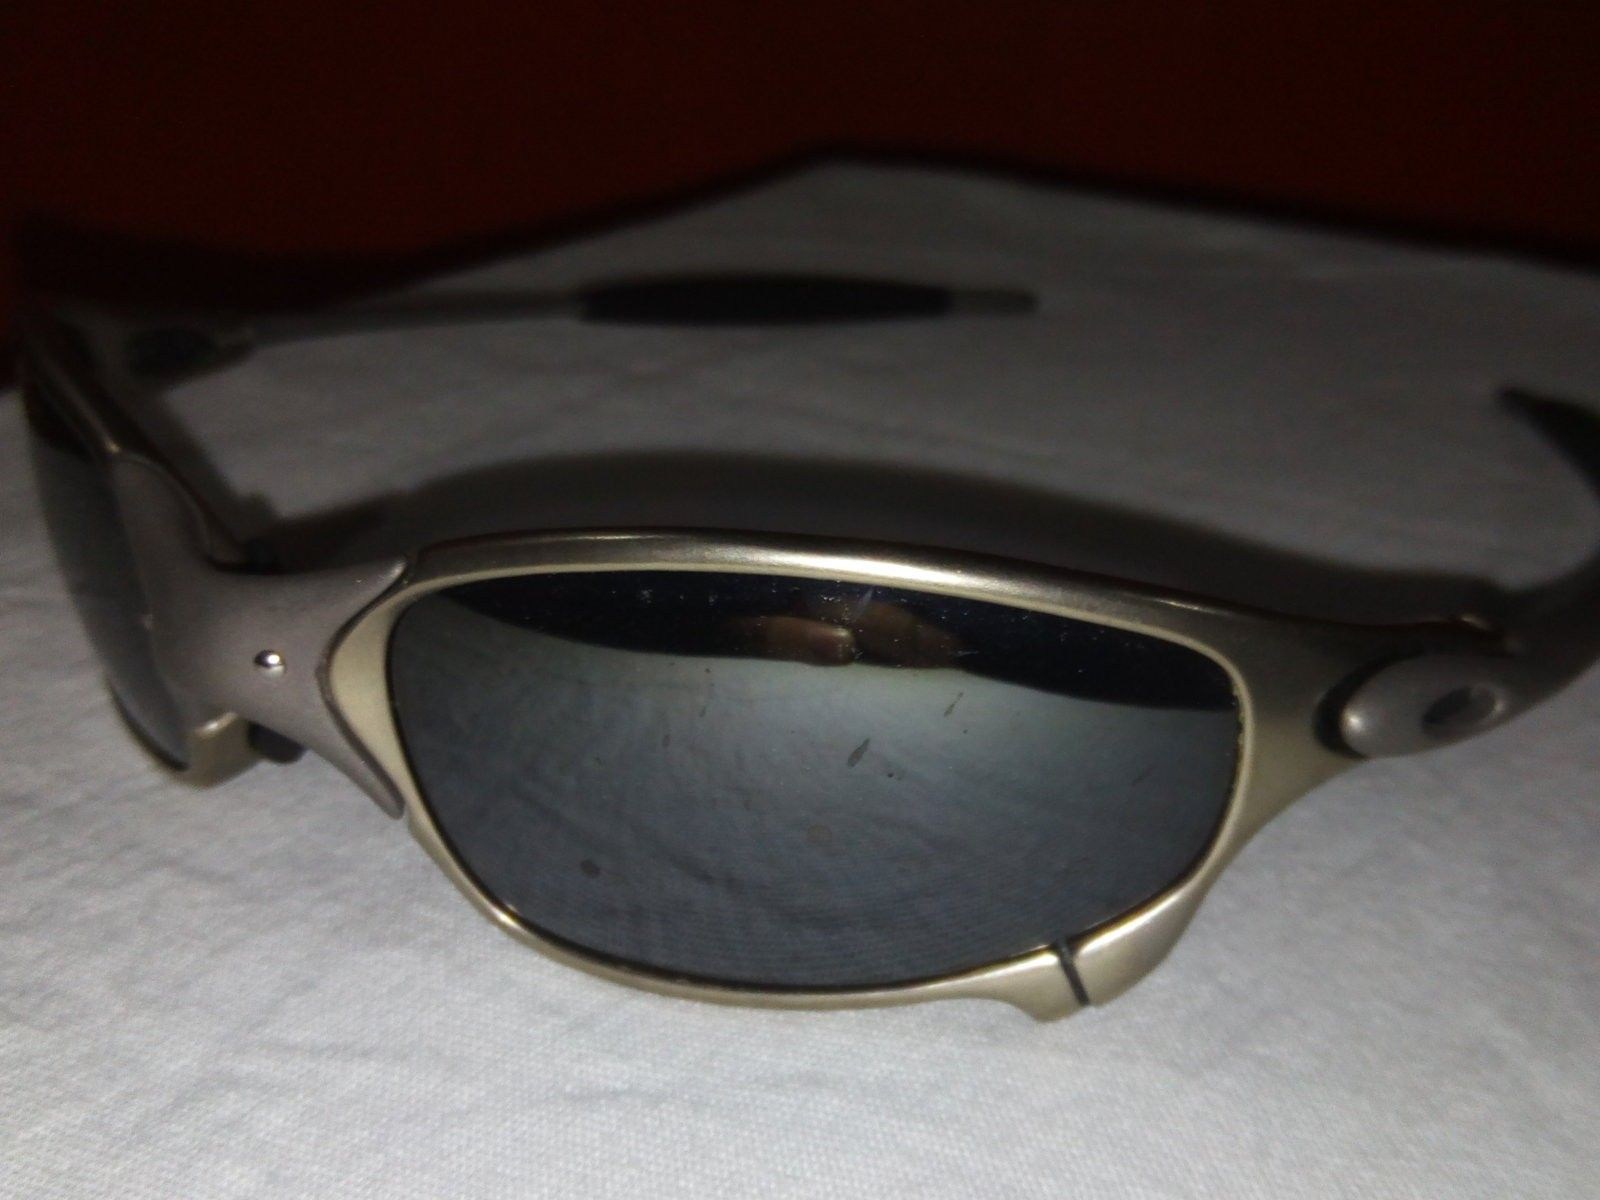 Warranty frame tio2 - IMG_20160327_160903.jpg